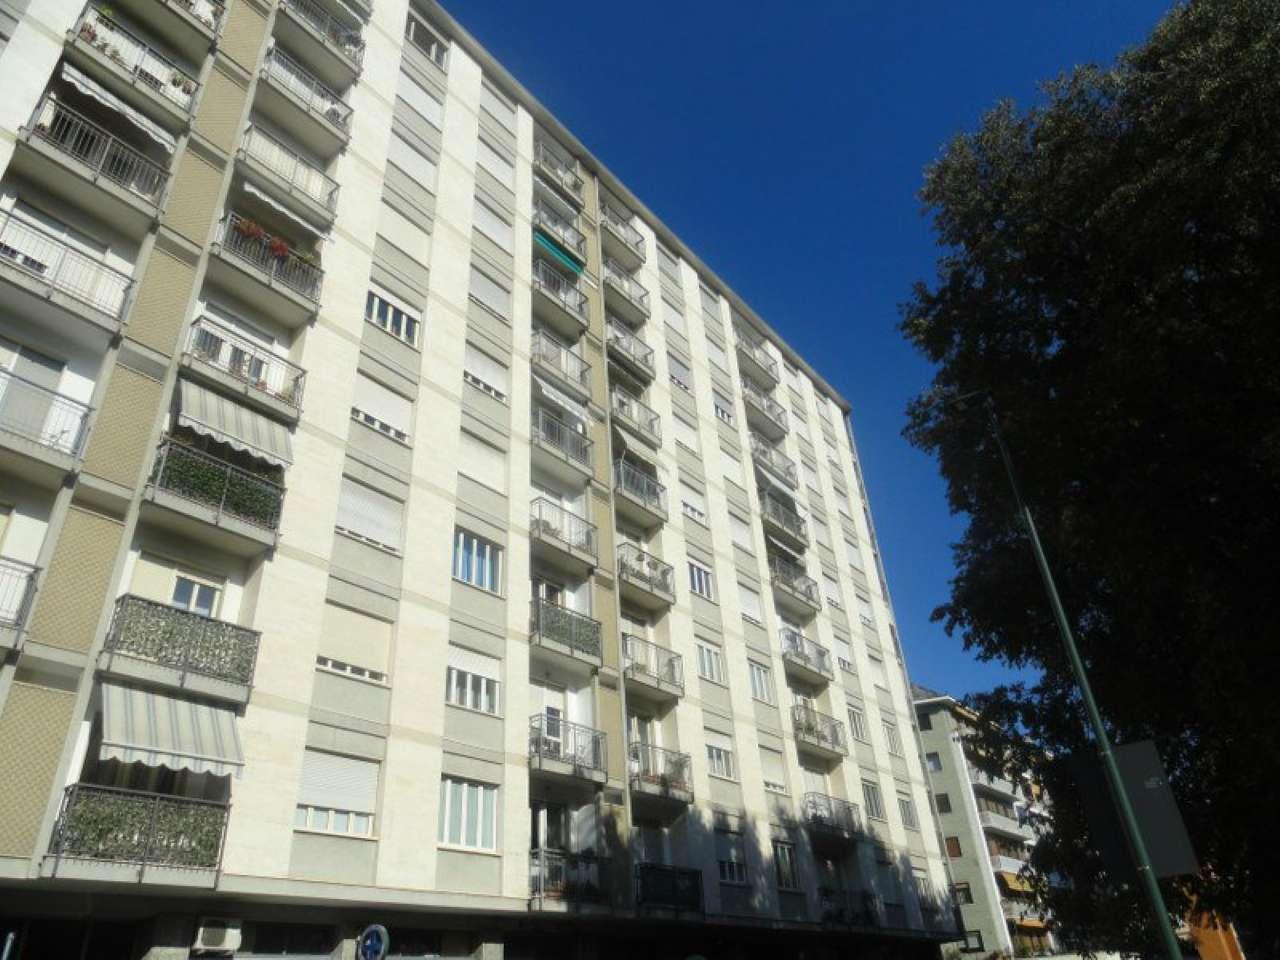 Bilocale Torino Via Buenos Aires 12